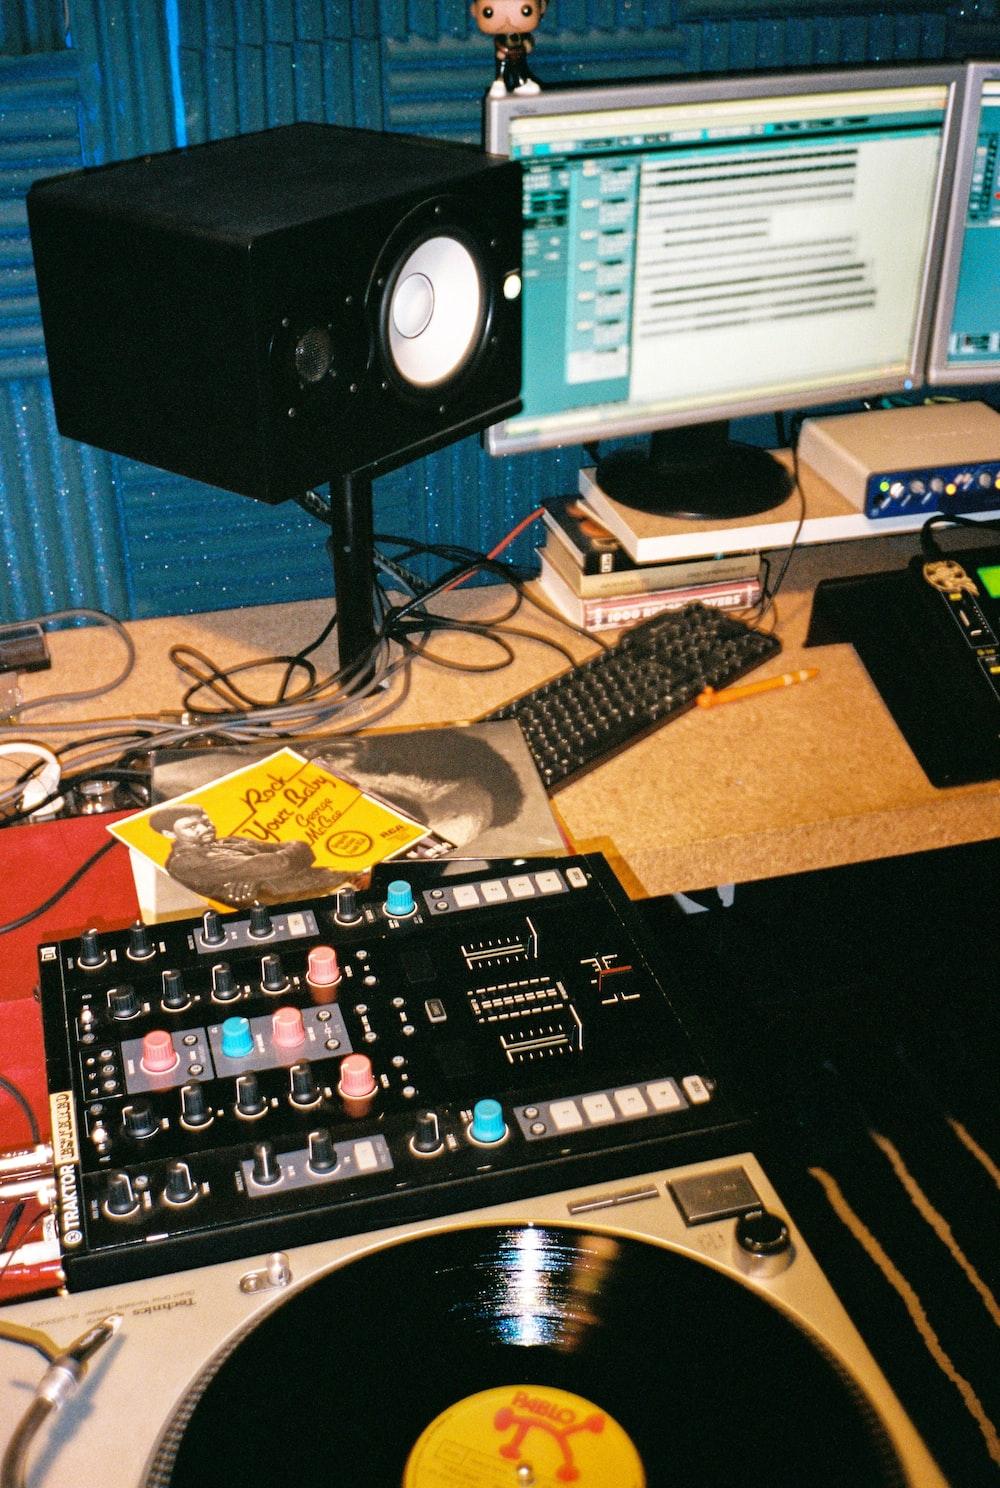 black audio mixer beside black computer keyboard